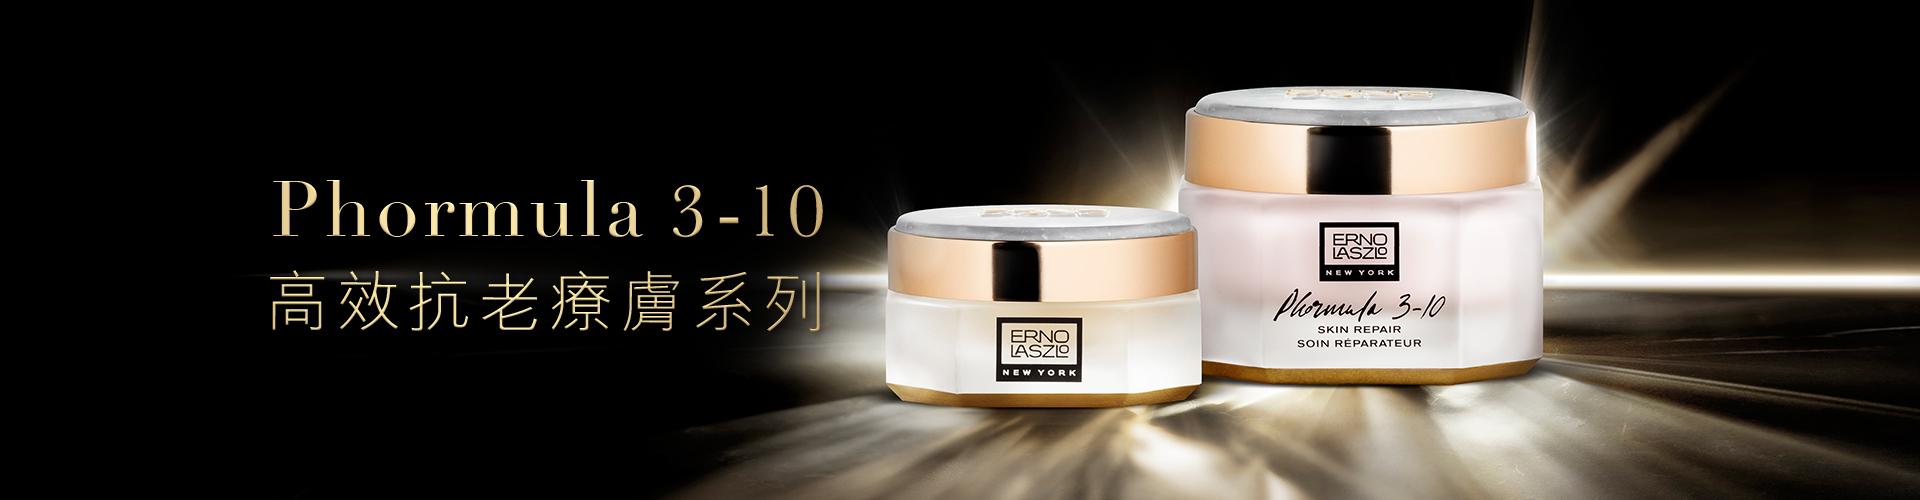 Phormula 3-10 高效抗老療膚系列